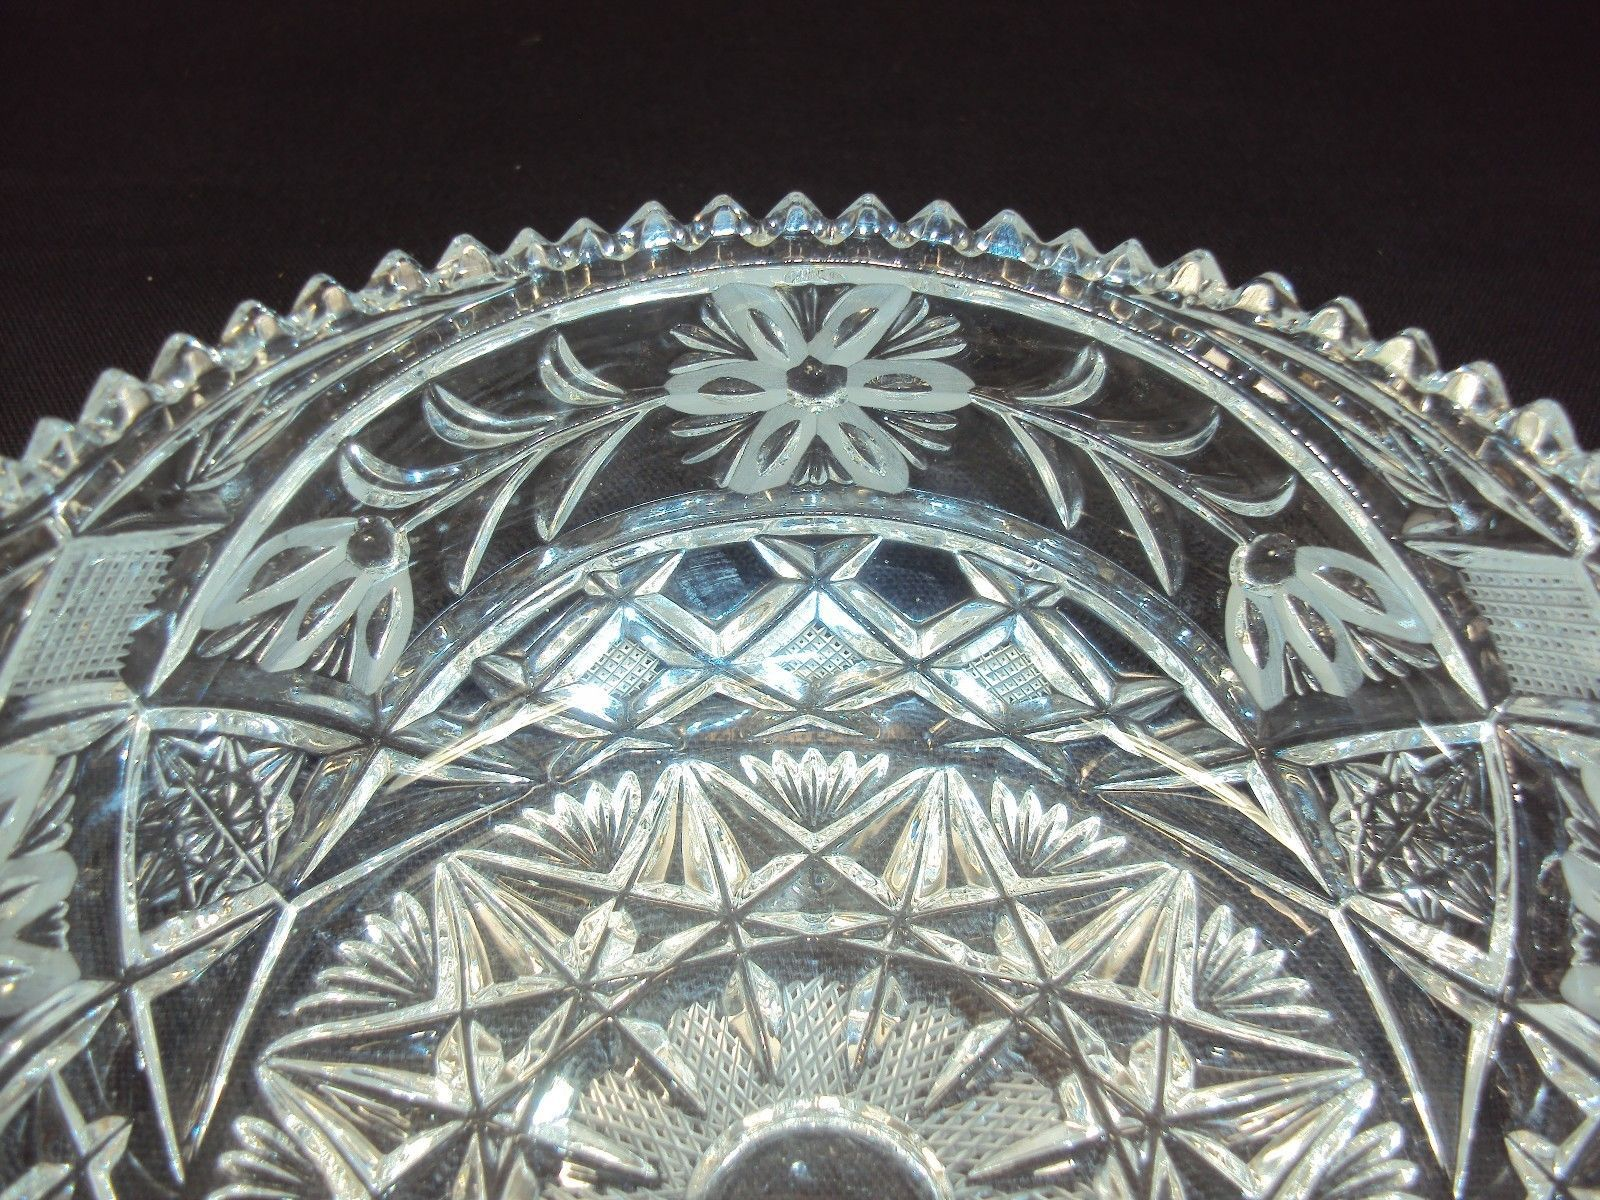 Cut Crystal Serving Bowls ~ Diamond Floral w/Sawtooth Rim ~ 1 Large, 1 Small